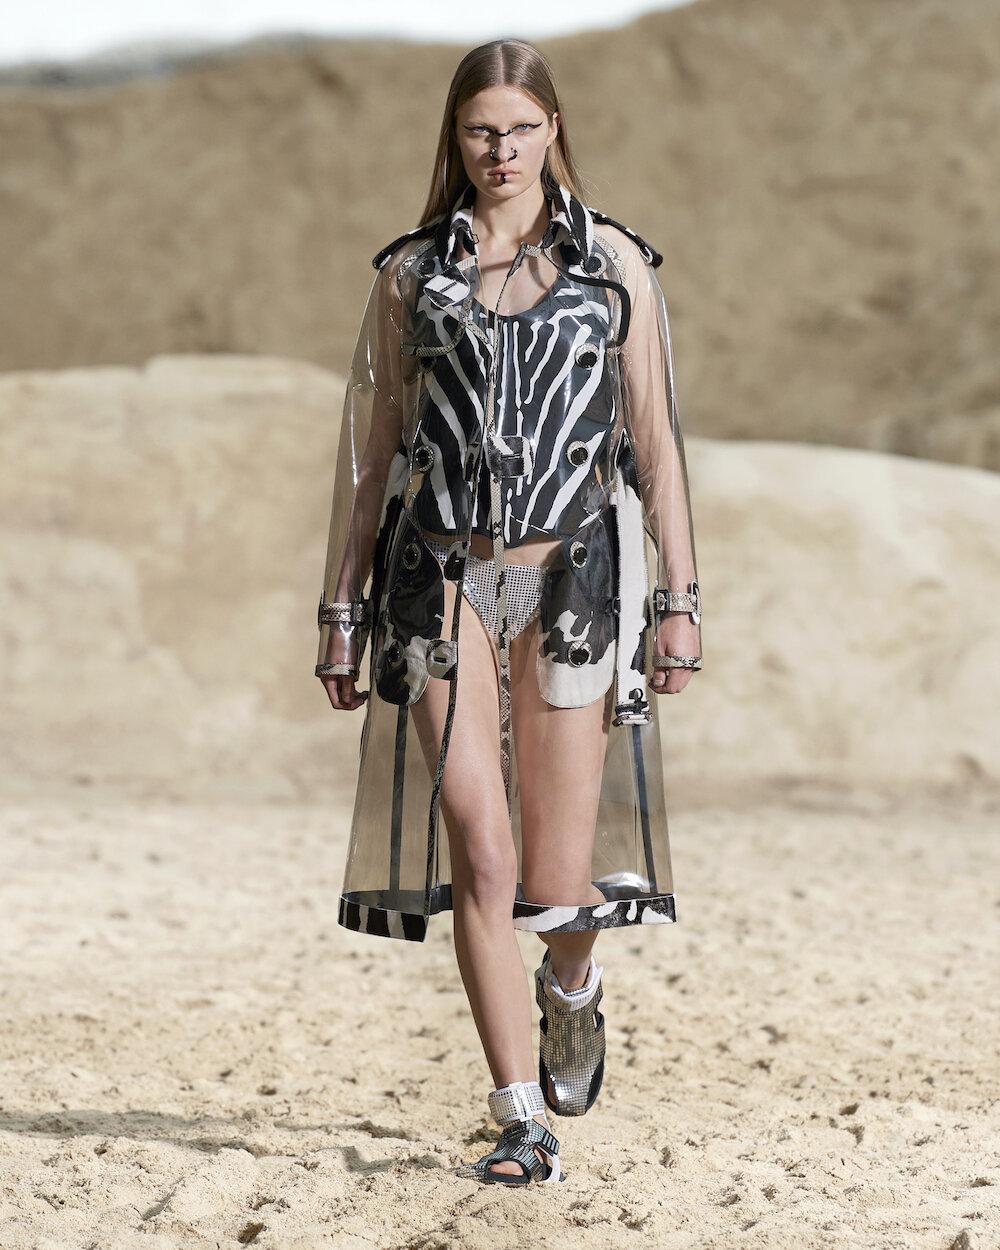 Burberry Spring_Summer 2022 Menswear Presentation Collection - Look 41 - Felice.jpg